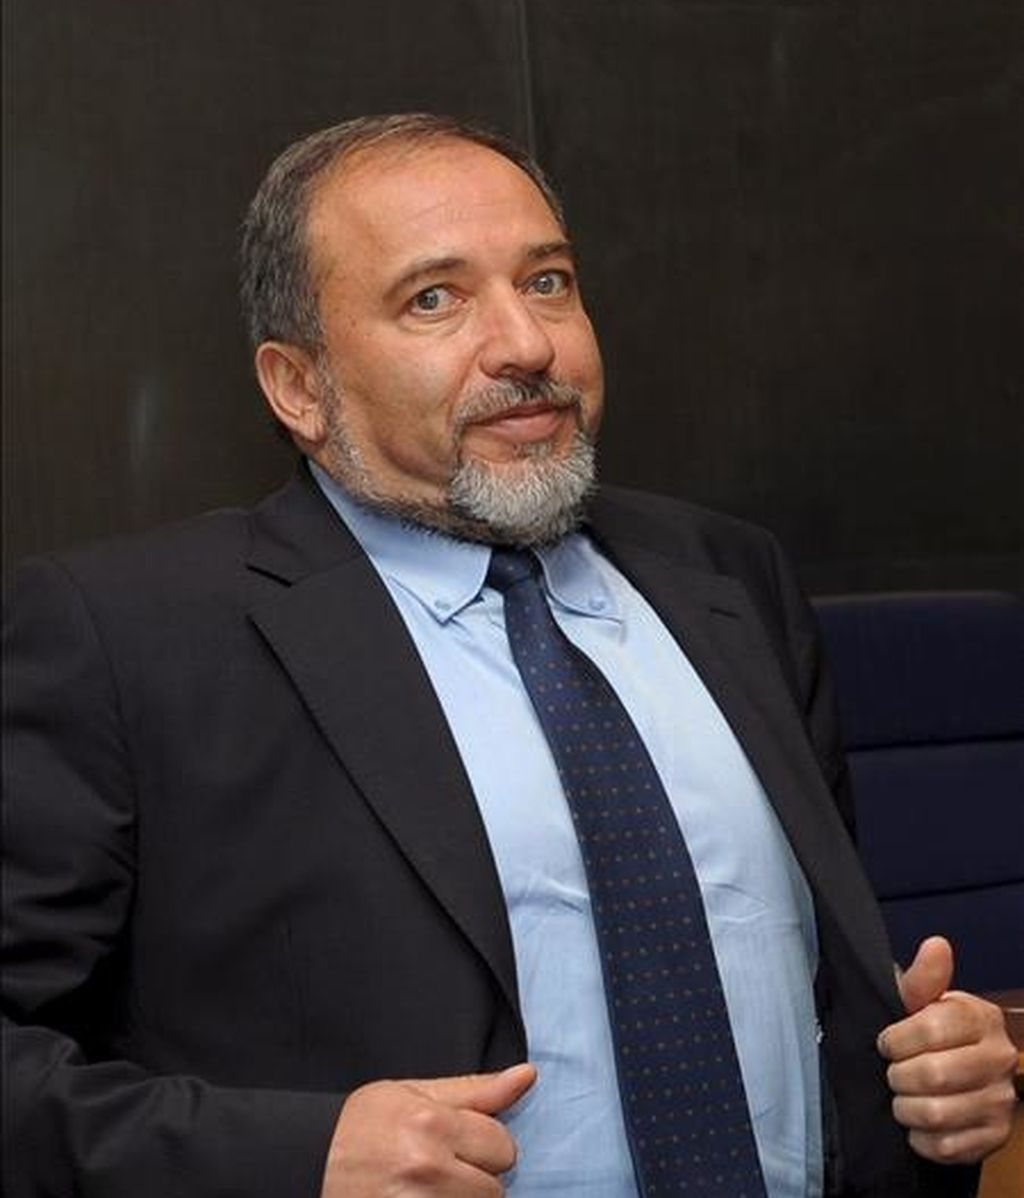 El ministro de Asuntos Exteriores israelí, Avigdor Liberman, hoy en Luxemburgo. EFE